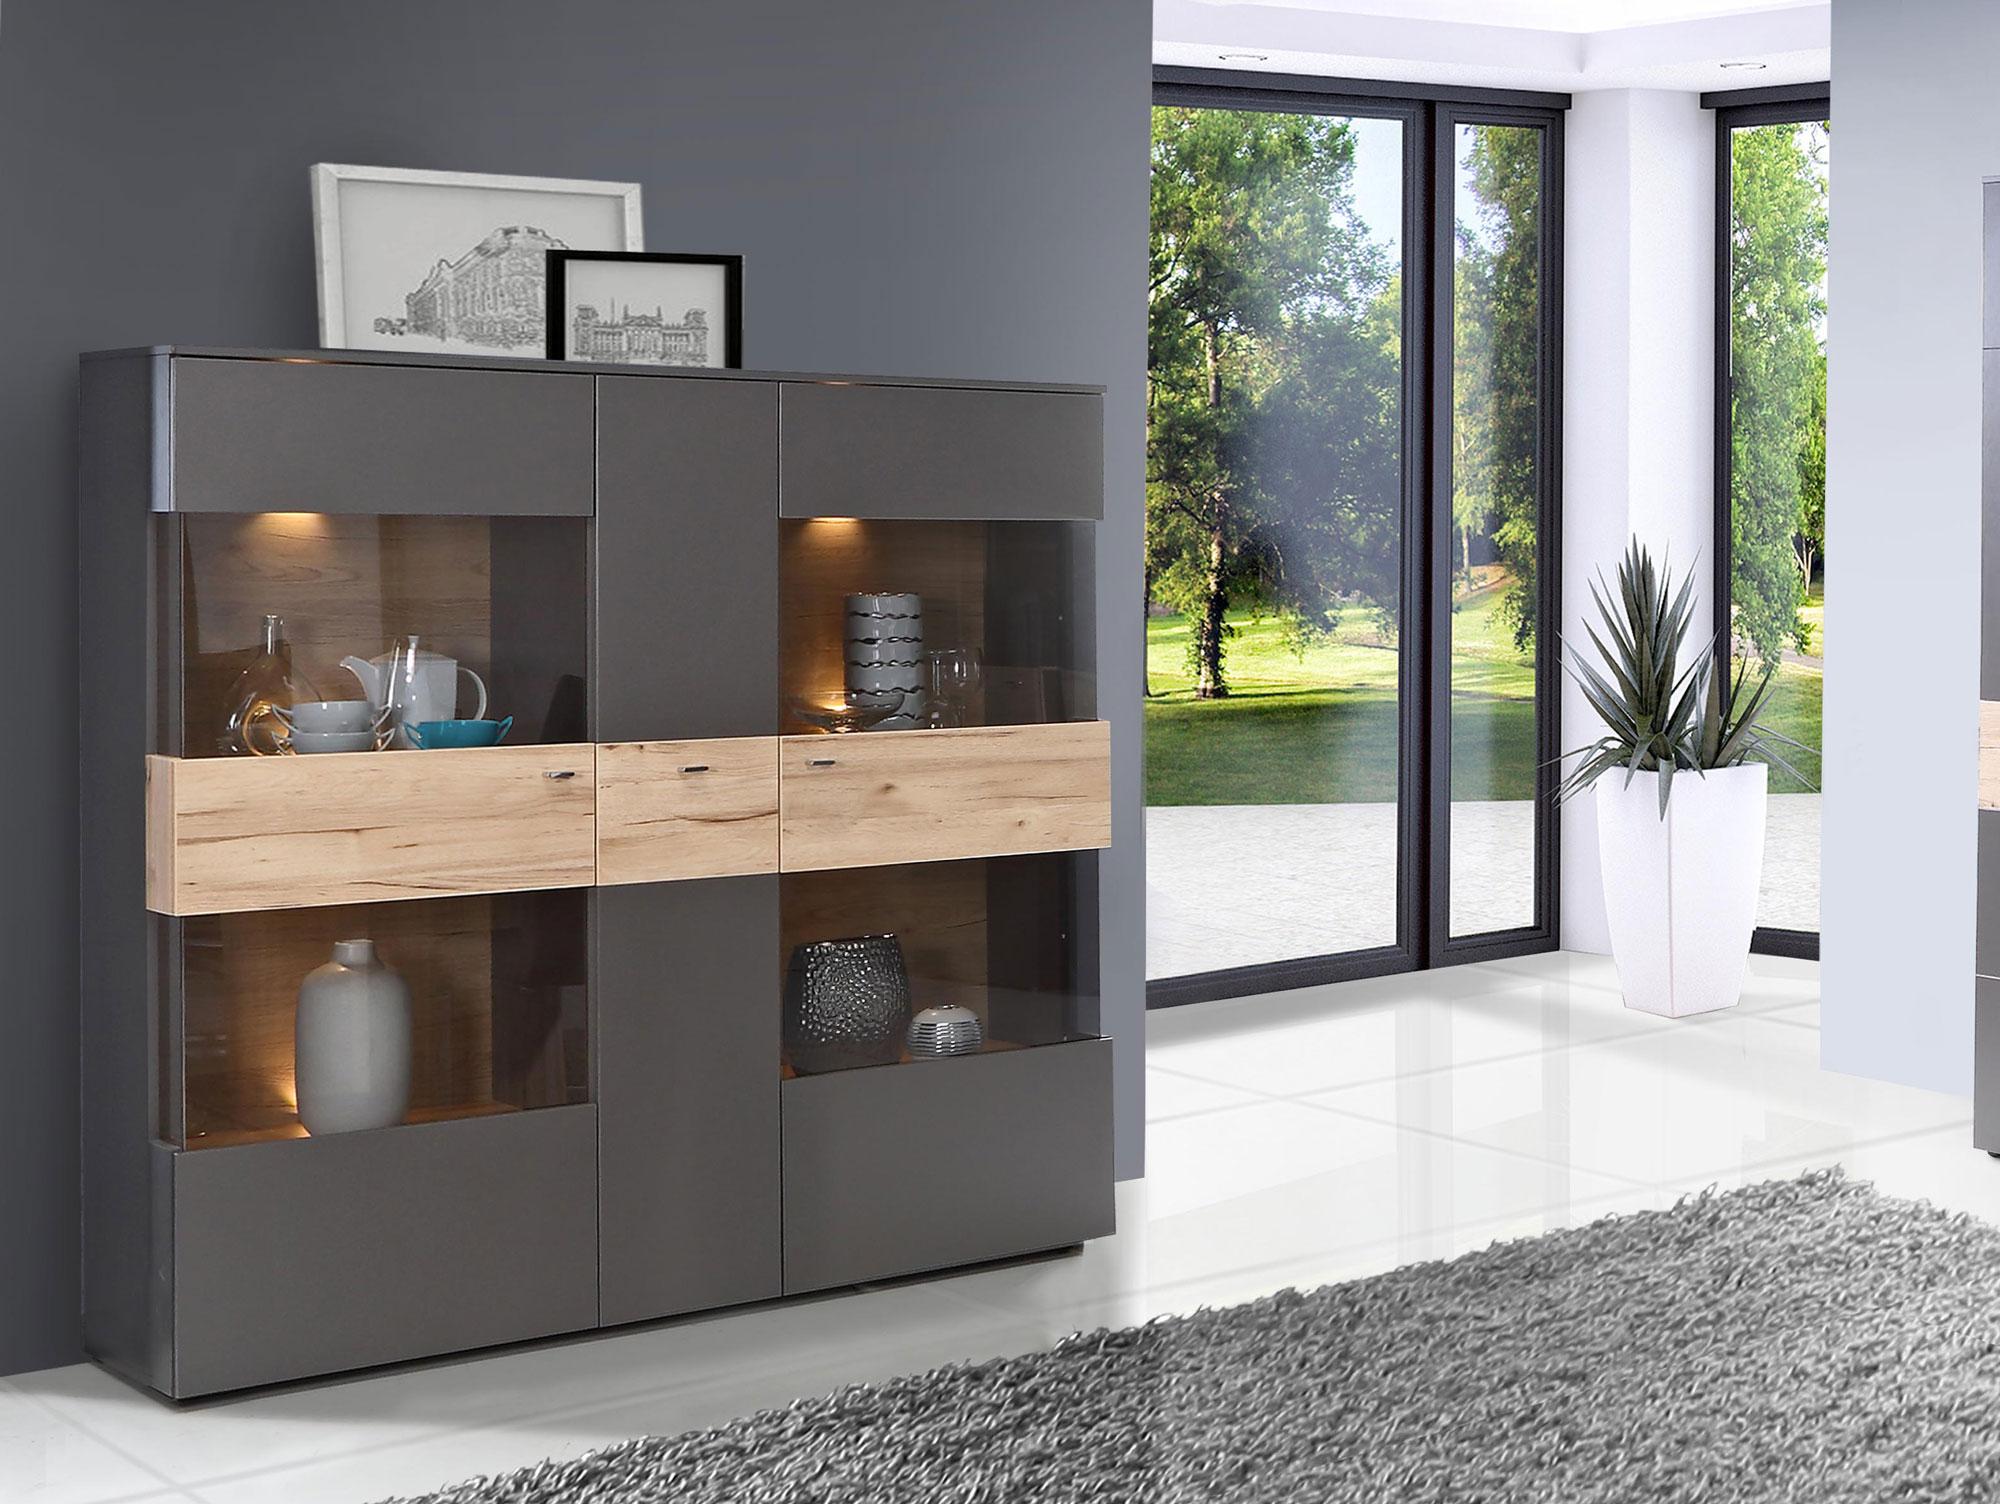 gnstige kissenhllen 40x40 top kissenbezug kissen. Black Bedroom Furniture Sets. Home Design Ideas